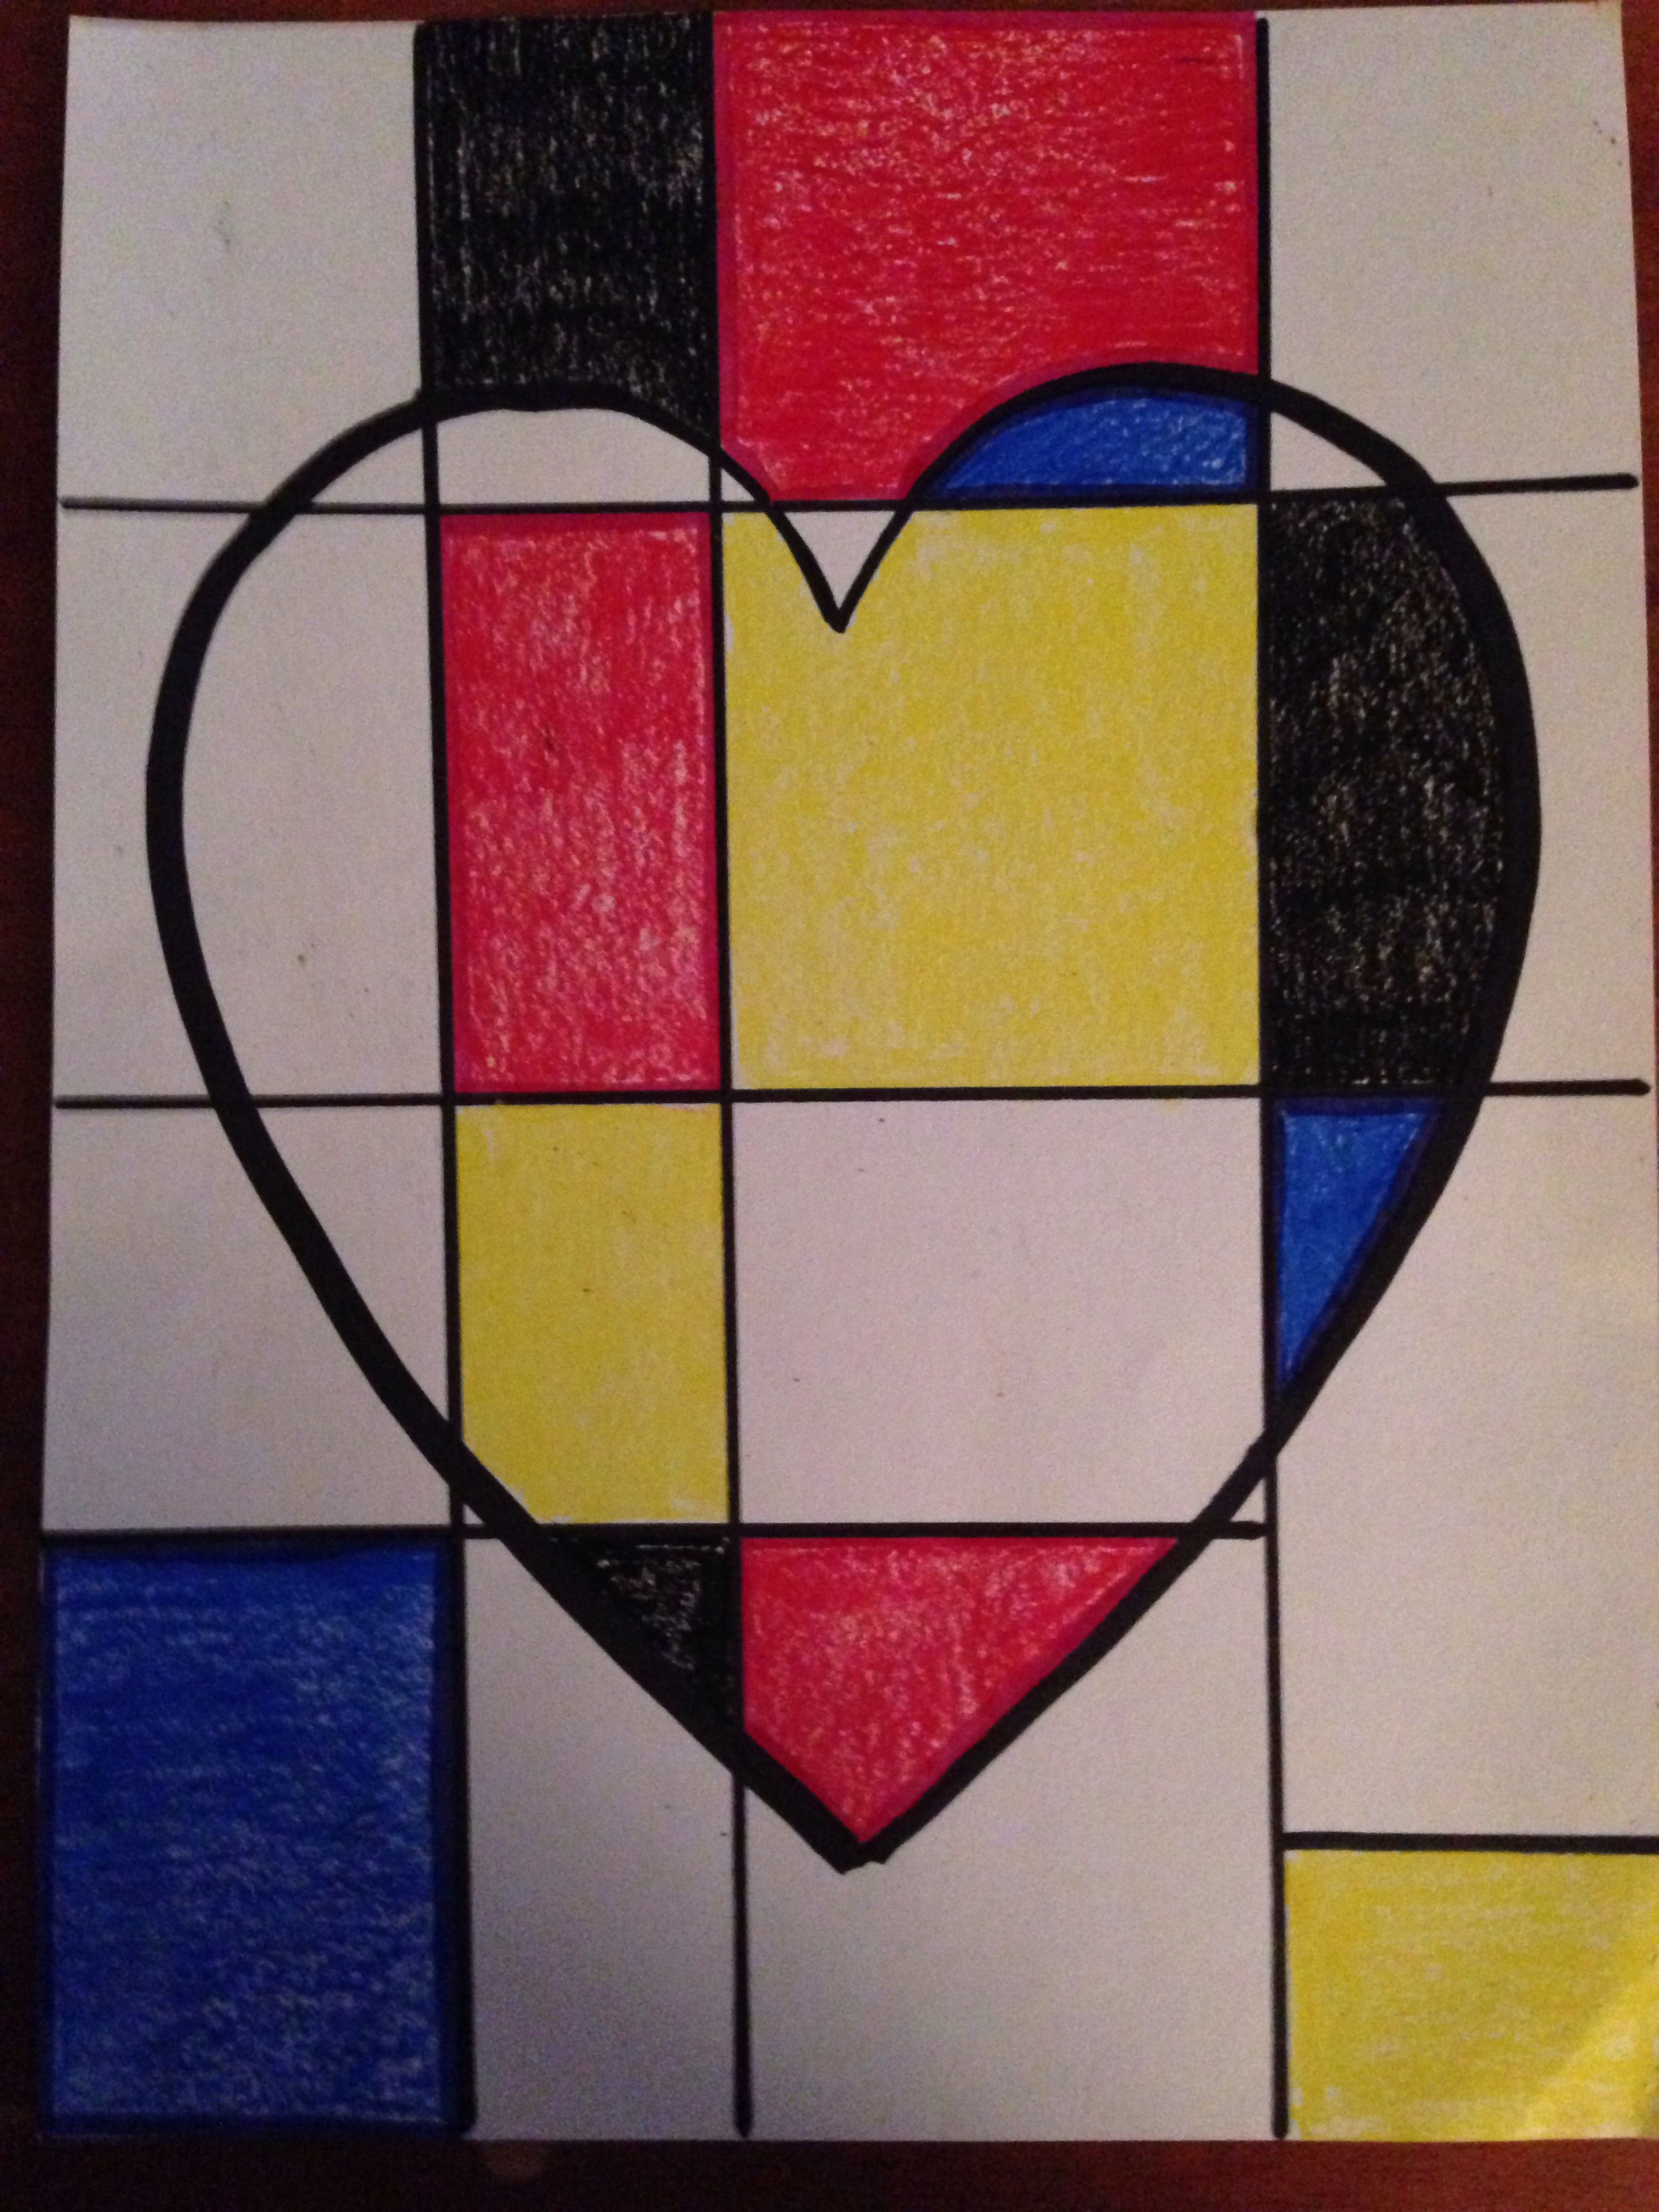 Mondrian Hearts Elementary Art Project